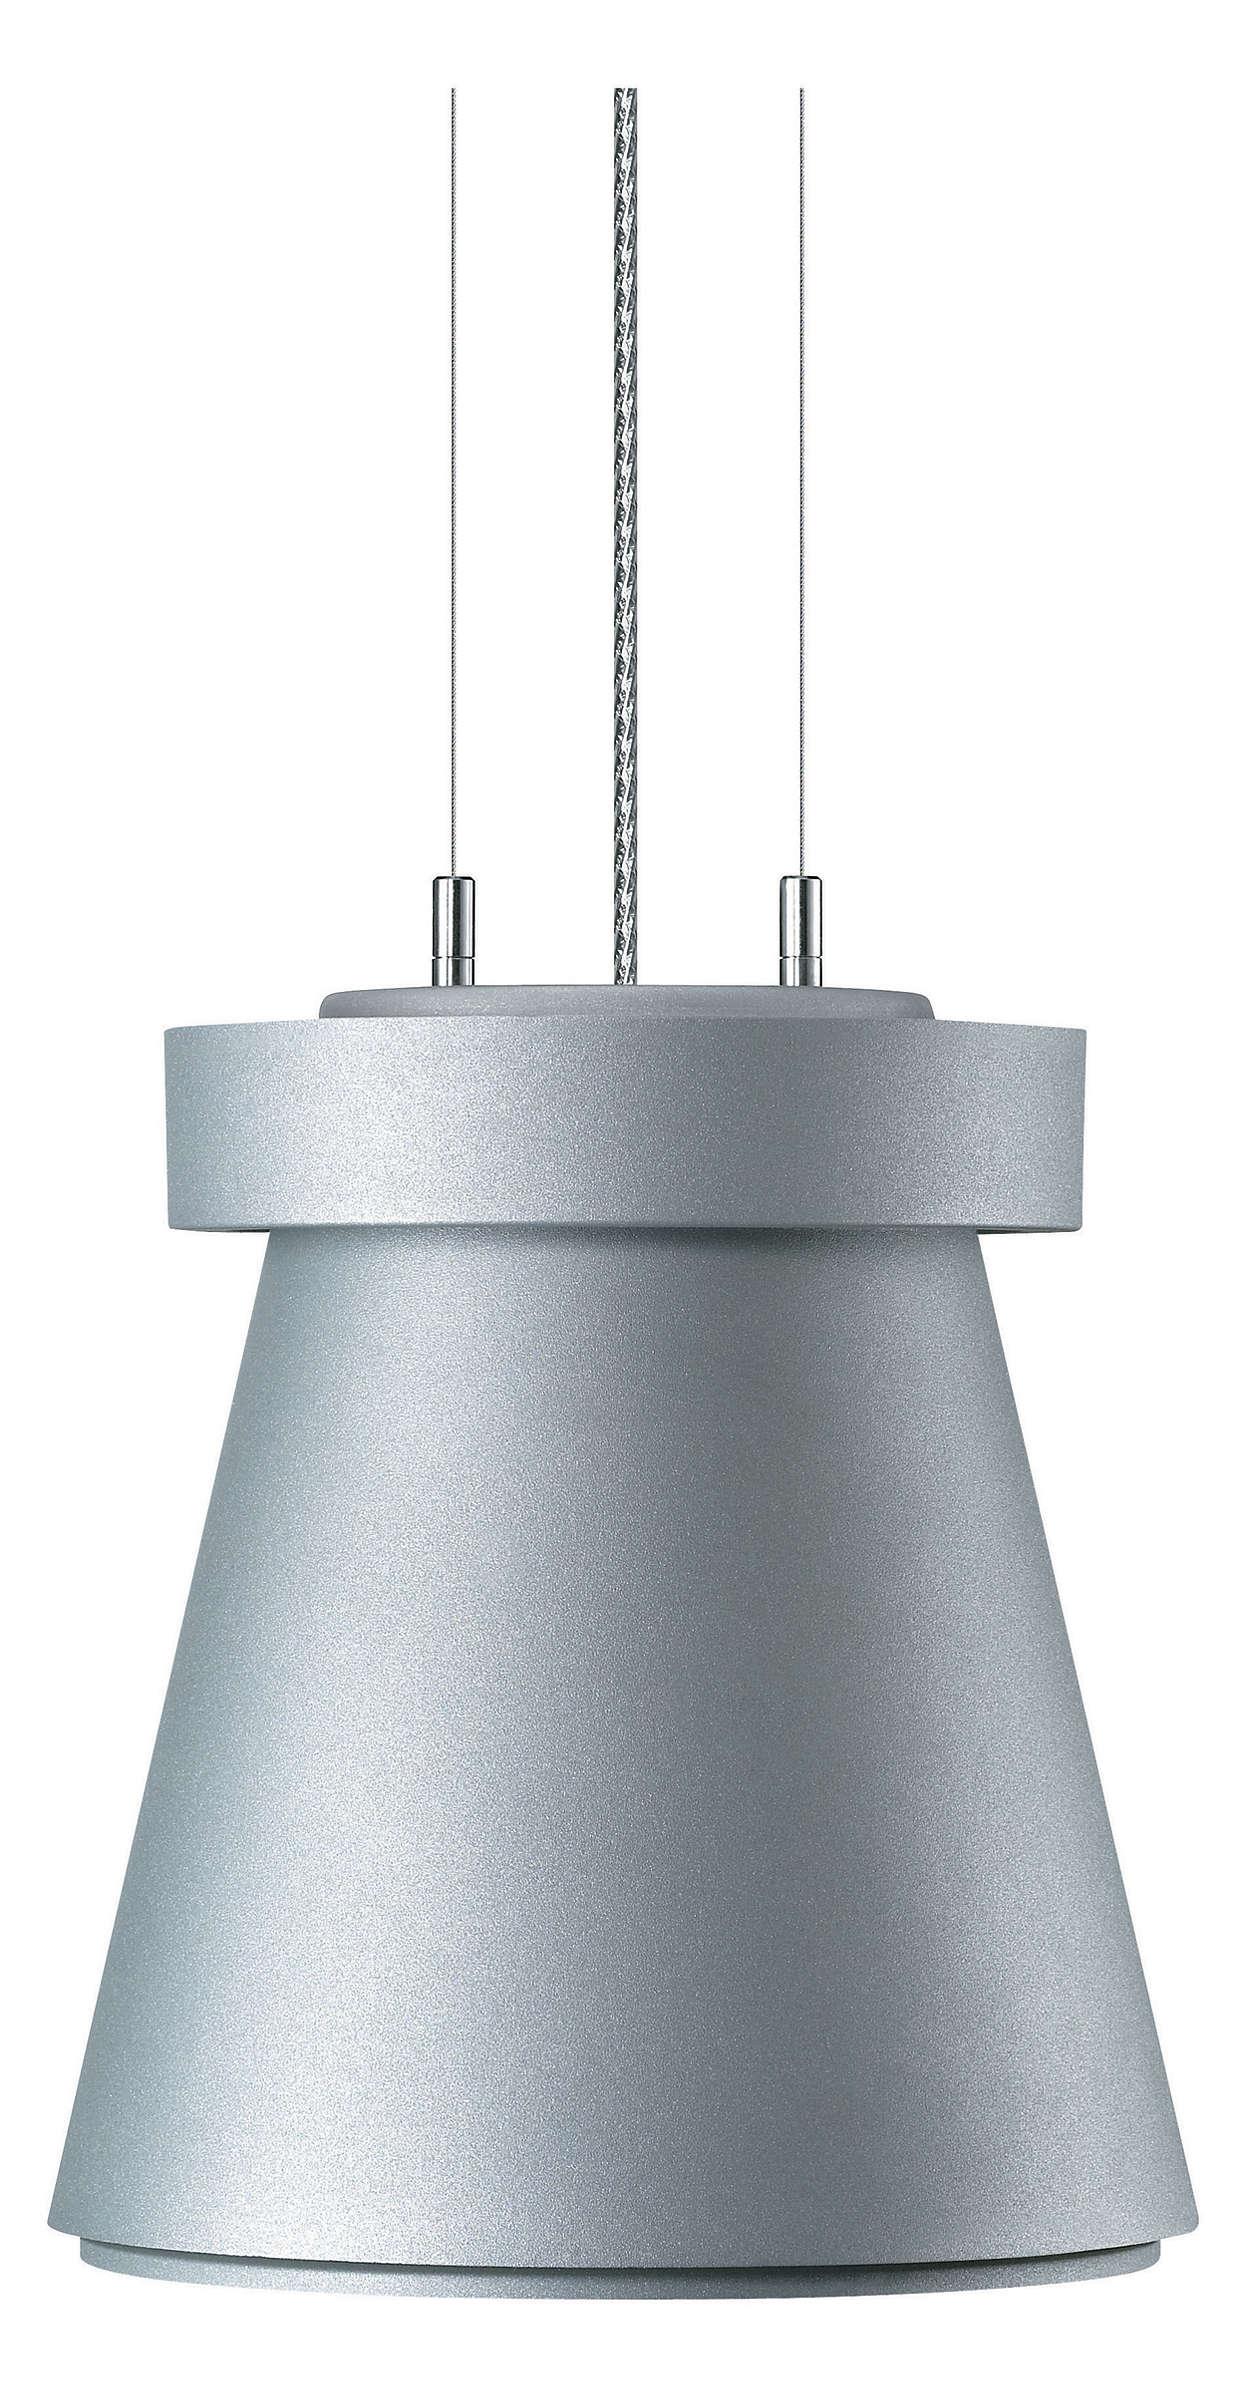 UnicOne Compact LED, pendant